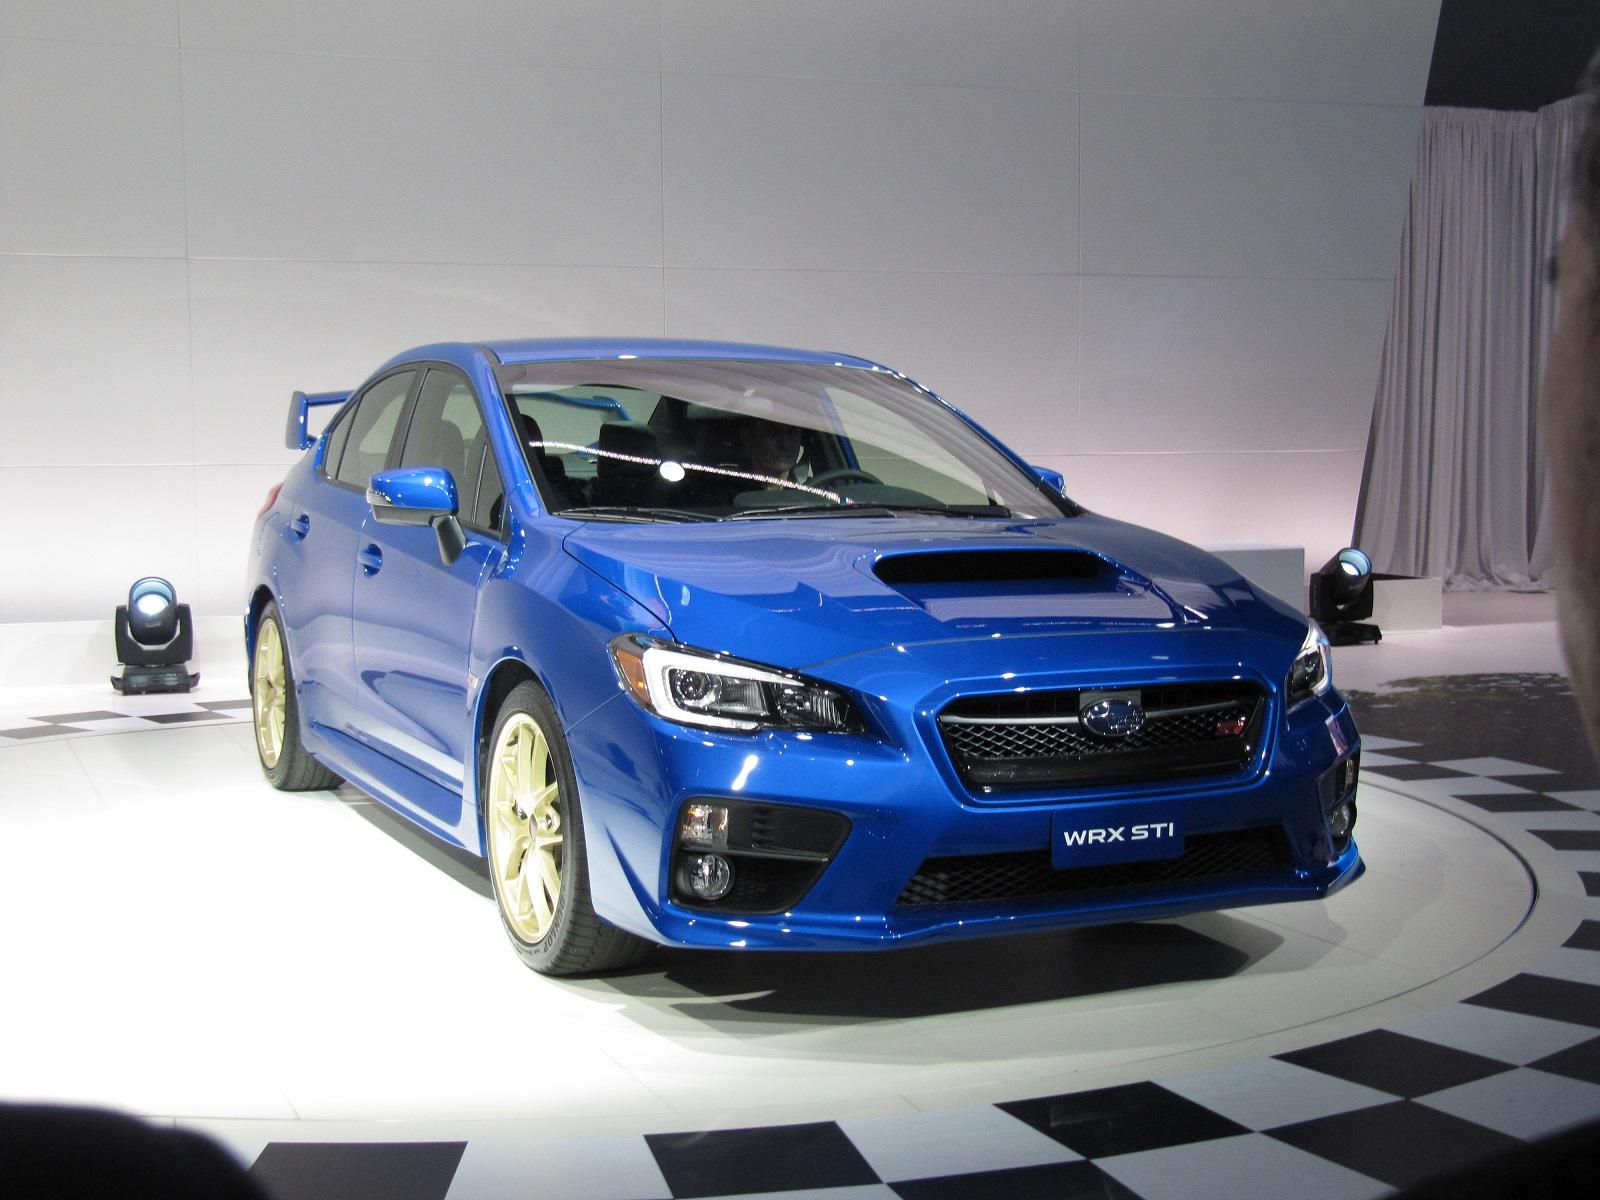 2015 Subaru WRX STI First Look: 2014 Detroit Auto Show Video